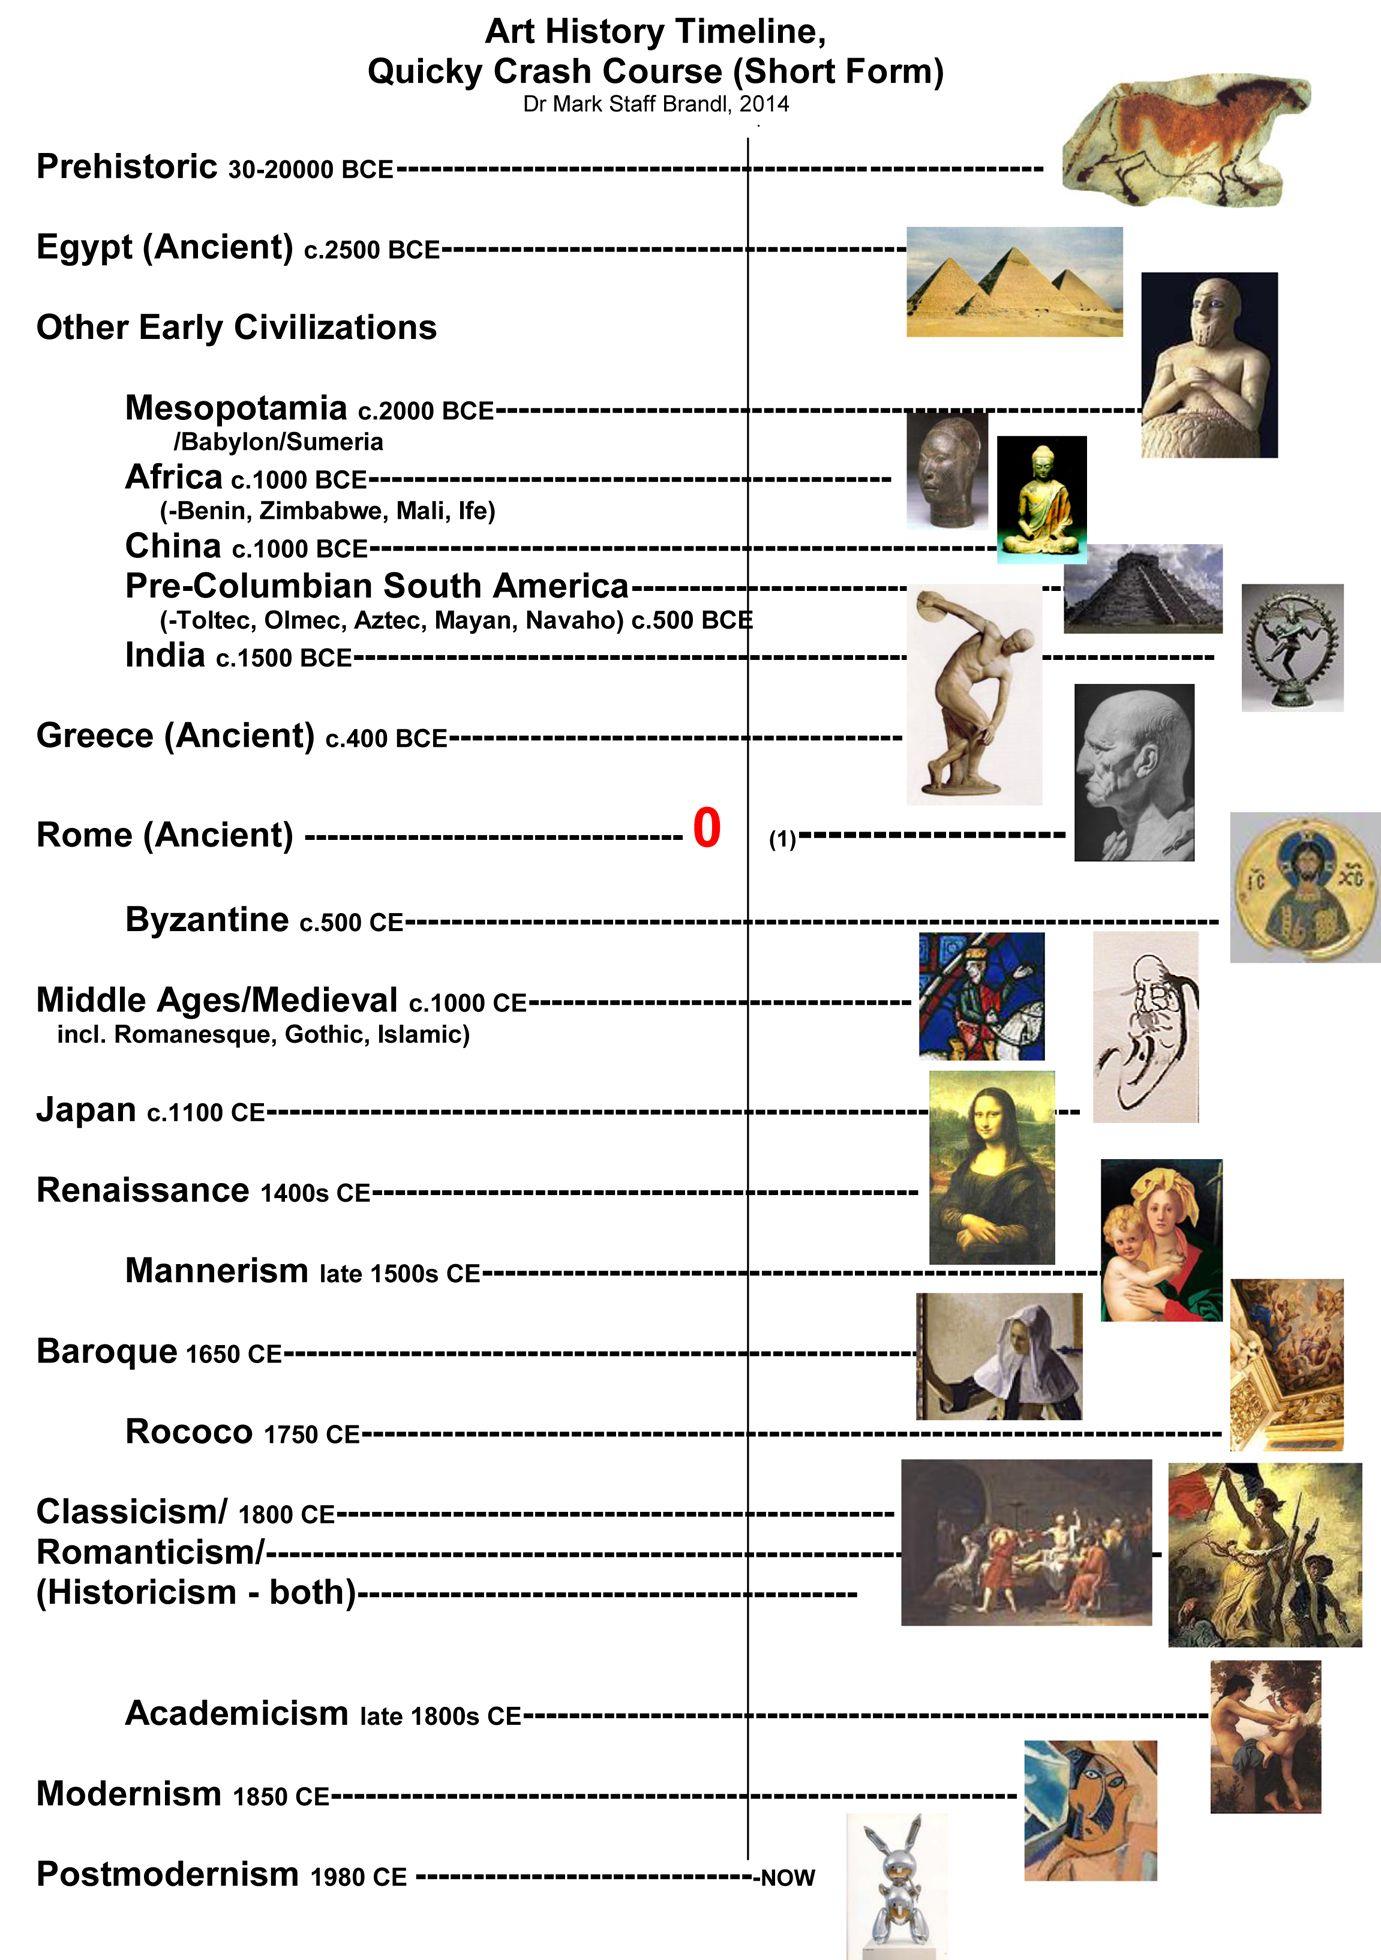 Metaphor And Art Art History Timeline Pre